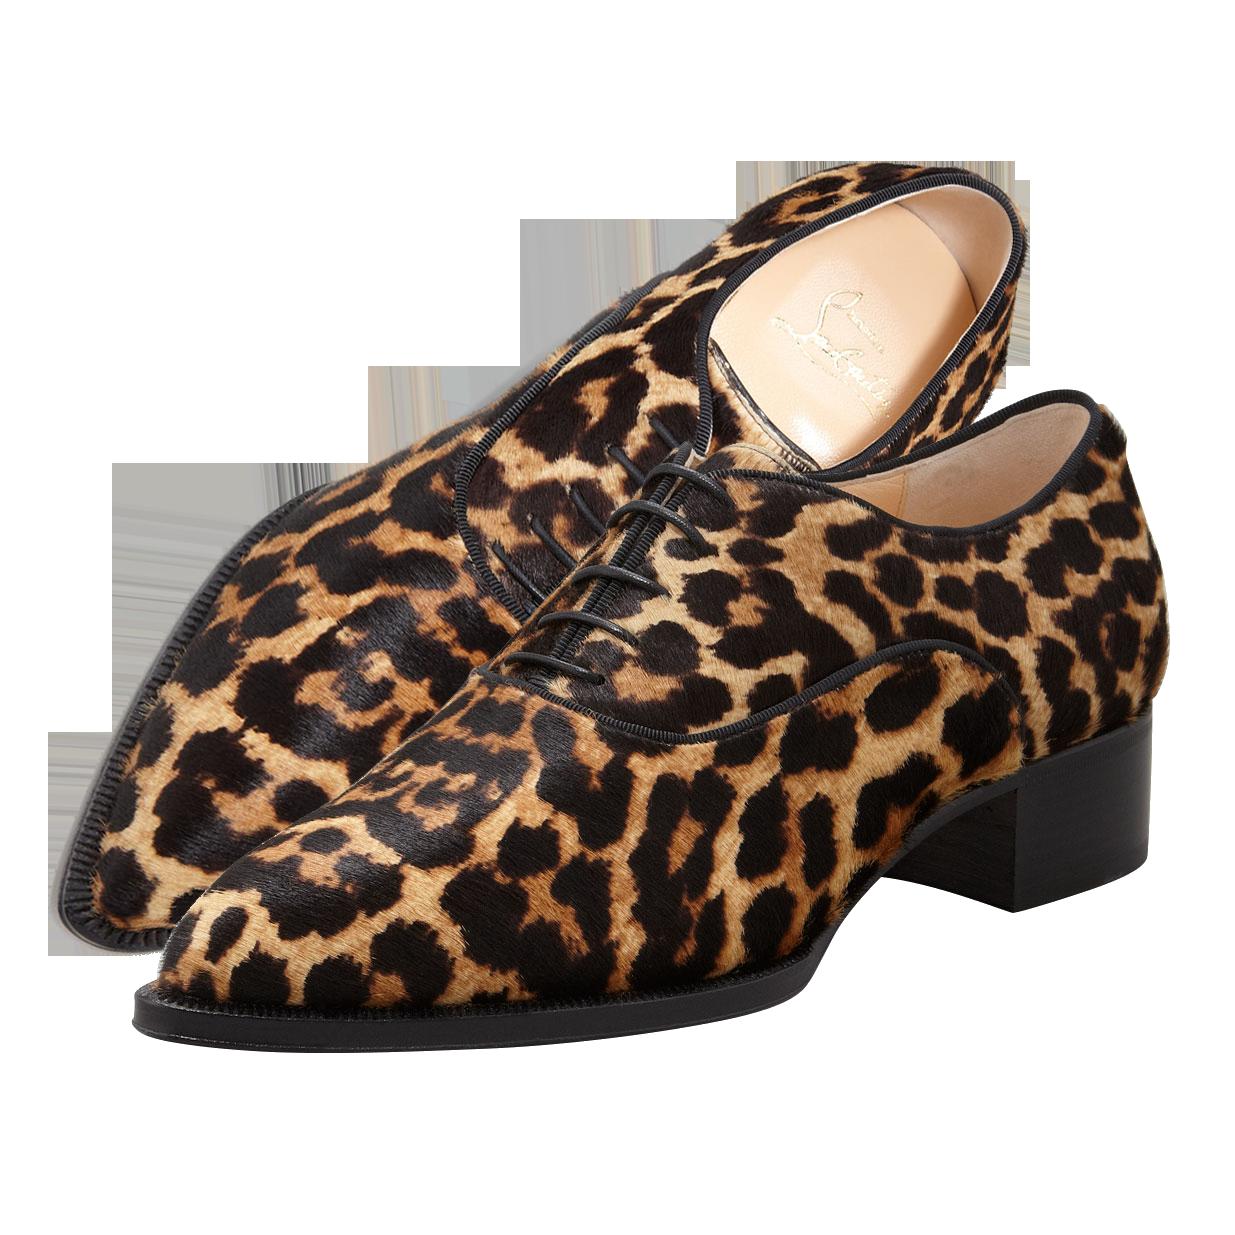 Christian Louboutin Zazou Pointed-Toe Leopard-Print Calf Hair Derby Flats